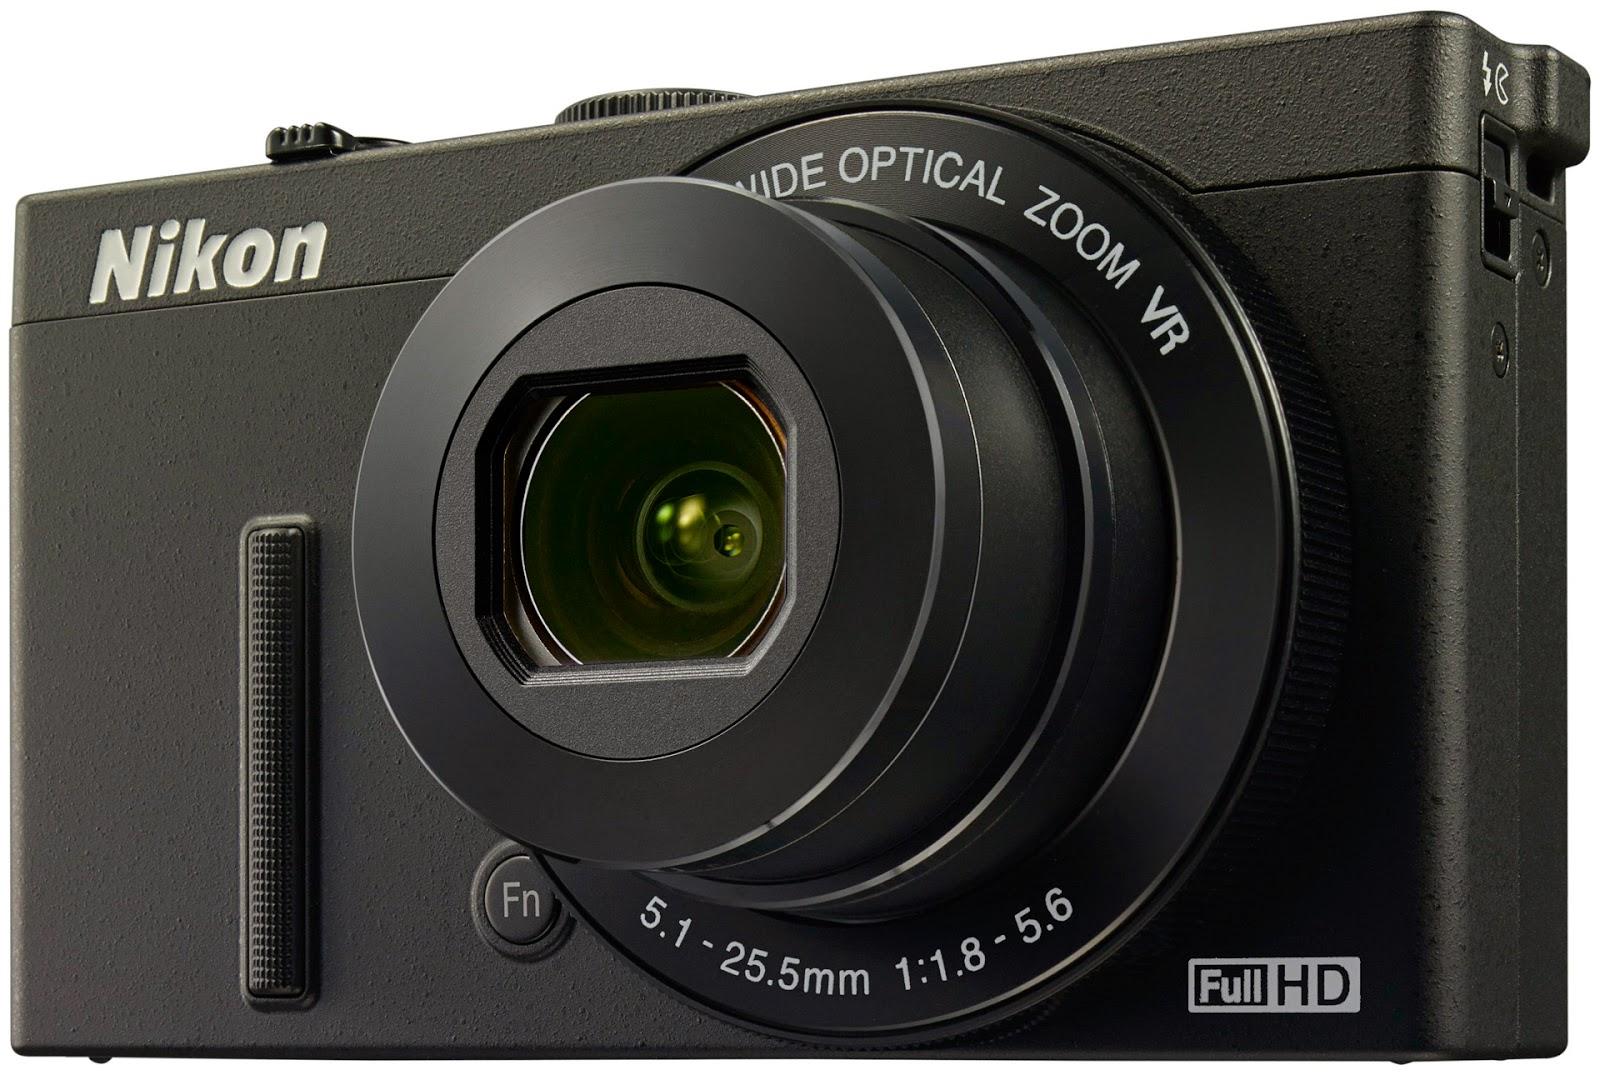 Nikon Coolpix P600, Nikon Coolpix P340, Nikon Coolpix P530, Nikon Coolpix P340, cámara prosumer, prosumer camera, Nikon vs Canon, Nikon Coolpix S9700